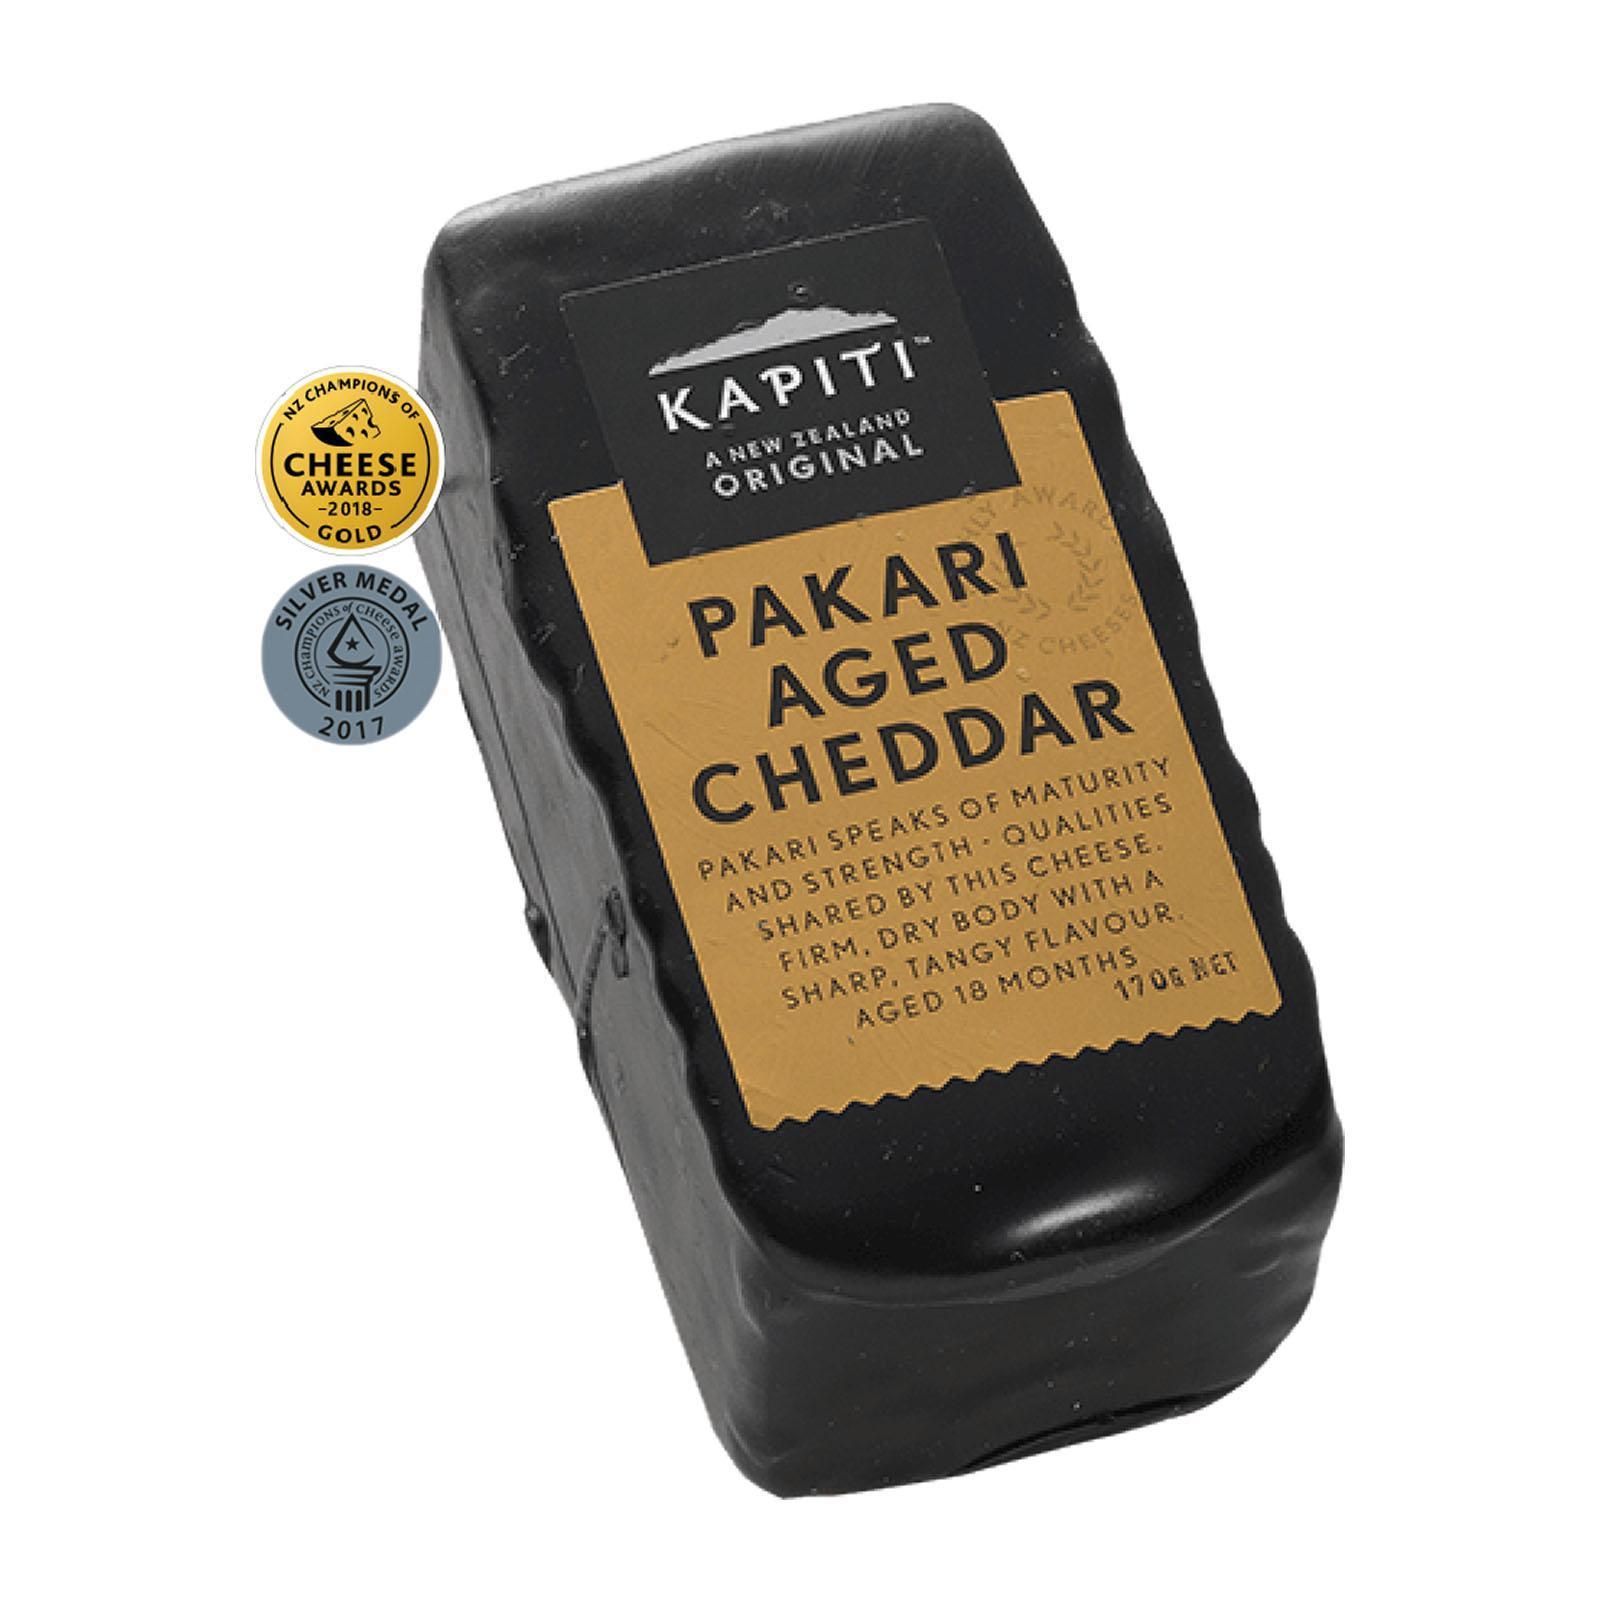 Kapiti Pakari Aged Cheddar - The Cellar Door